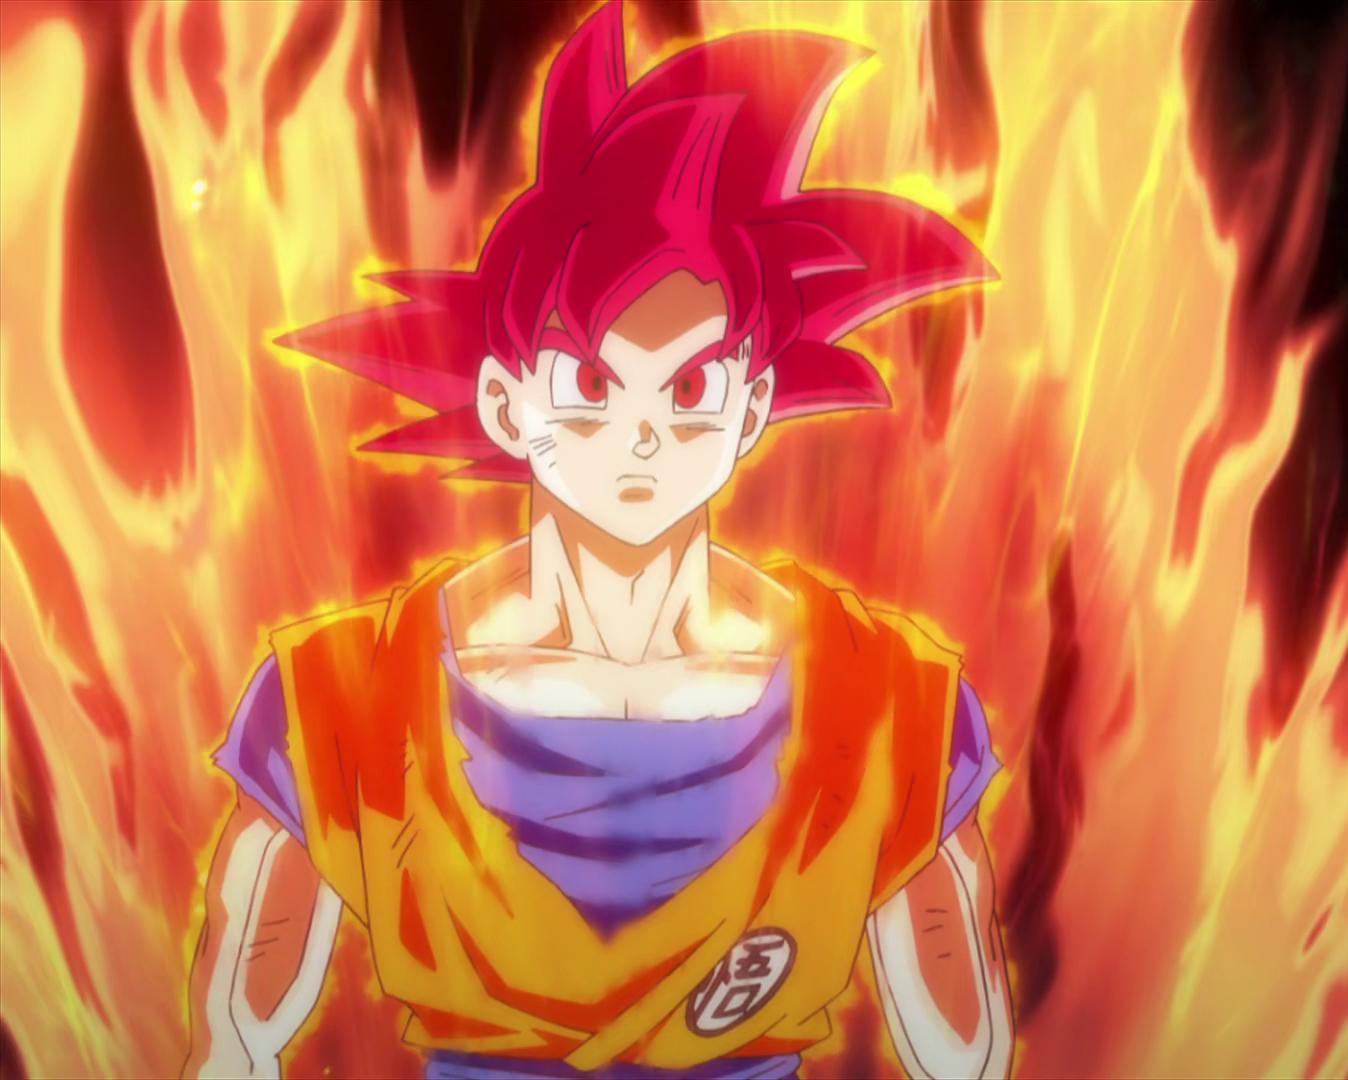 Dibujo De Goku Super Sayayin Dios Fase 5 Pintado Por En: Dragon Universe Wikia